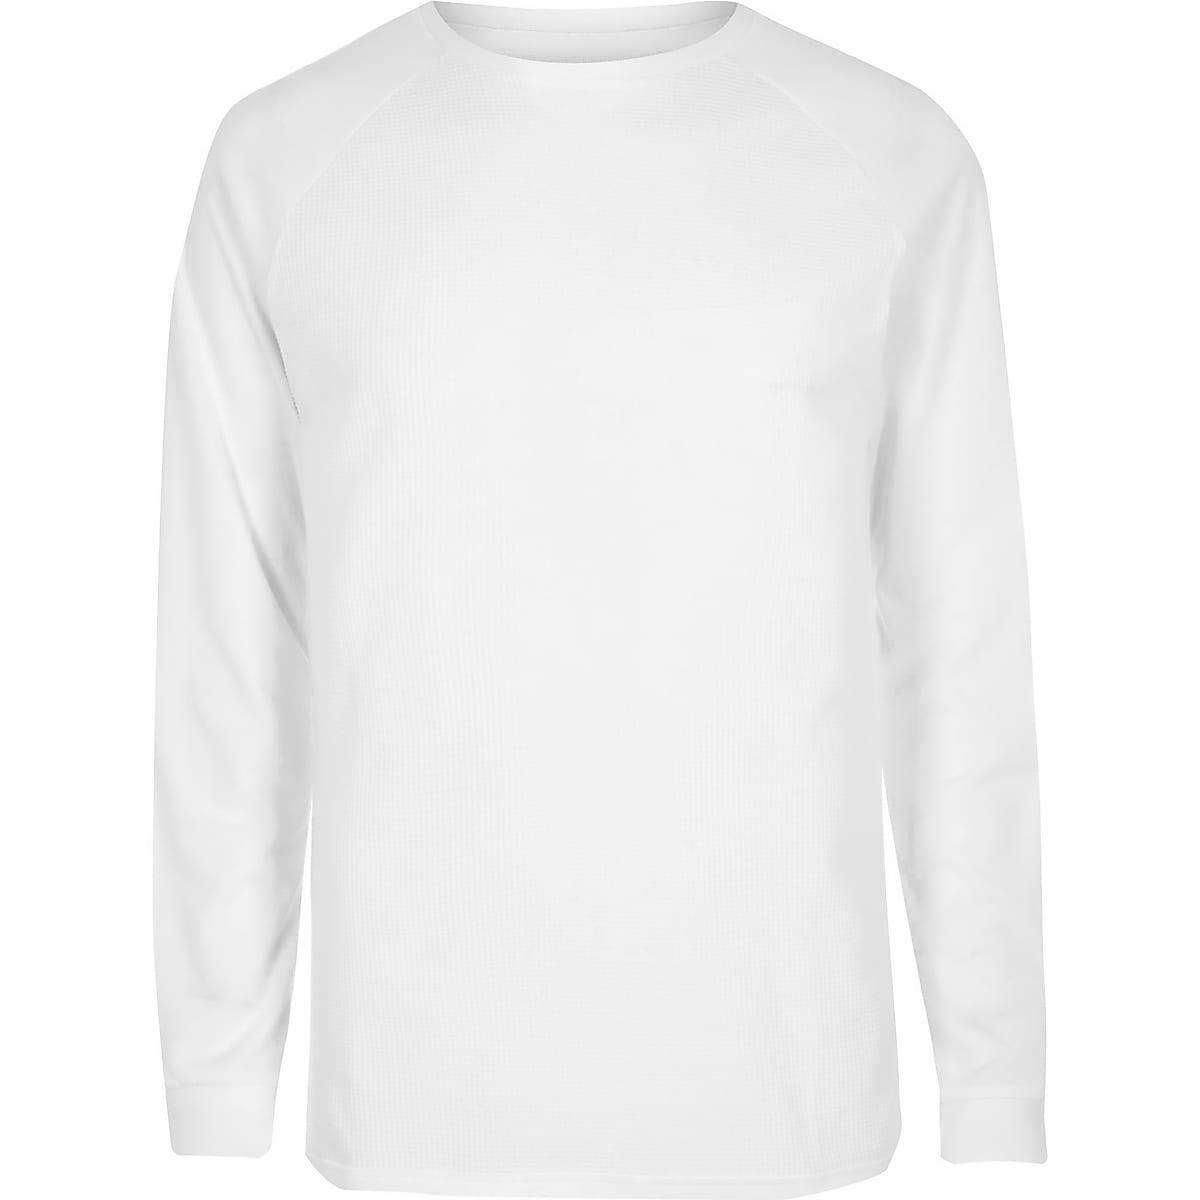 885060afa White waffle long sleeve raglan T-shirt - Long Sleeve T-Shirts - T ...